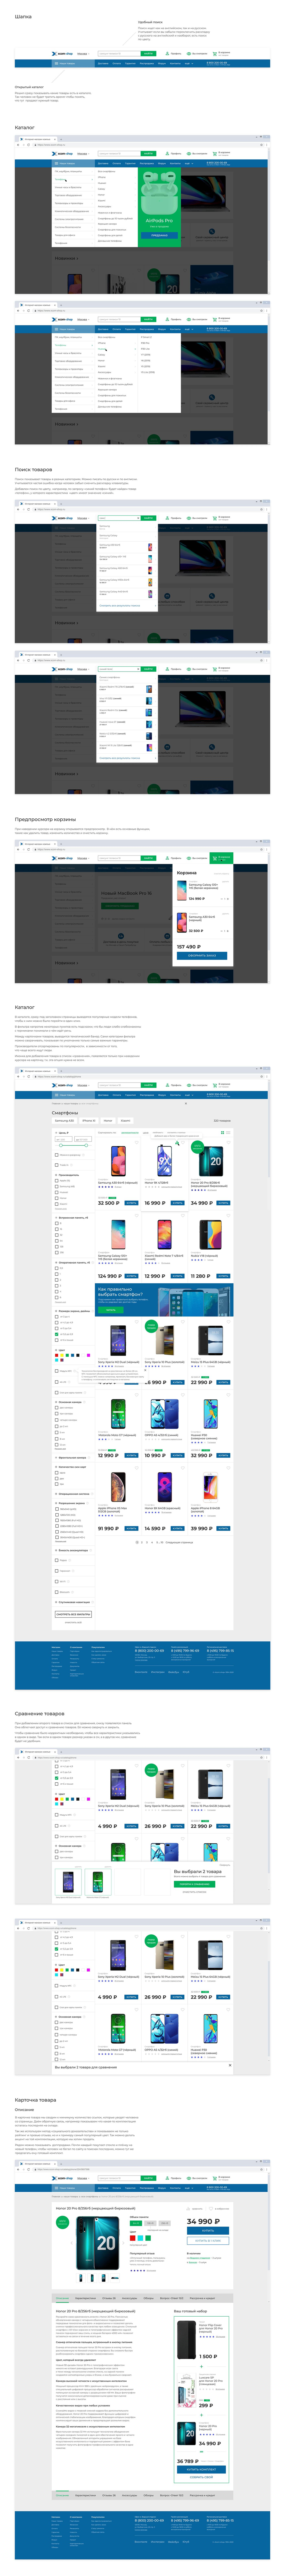 e-commerce shop store Electronics